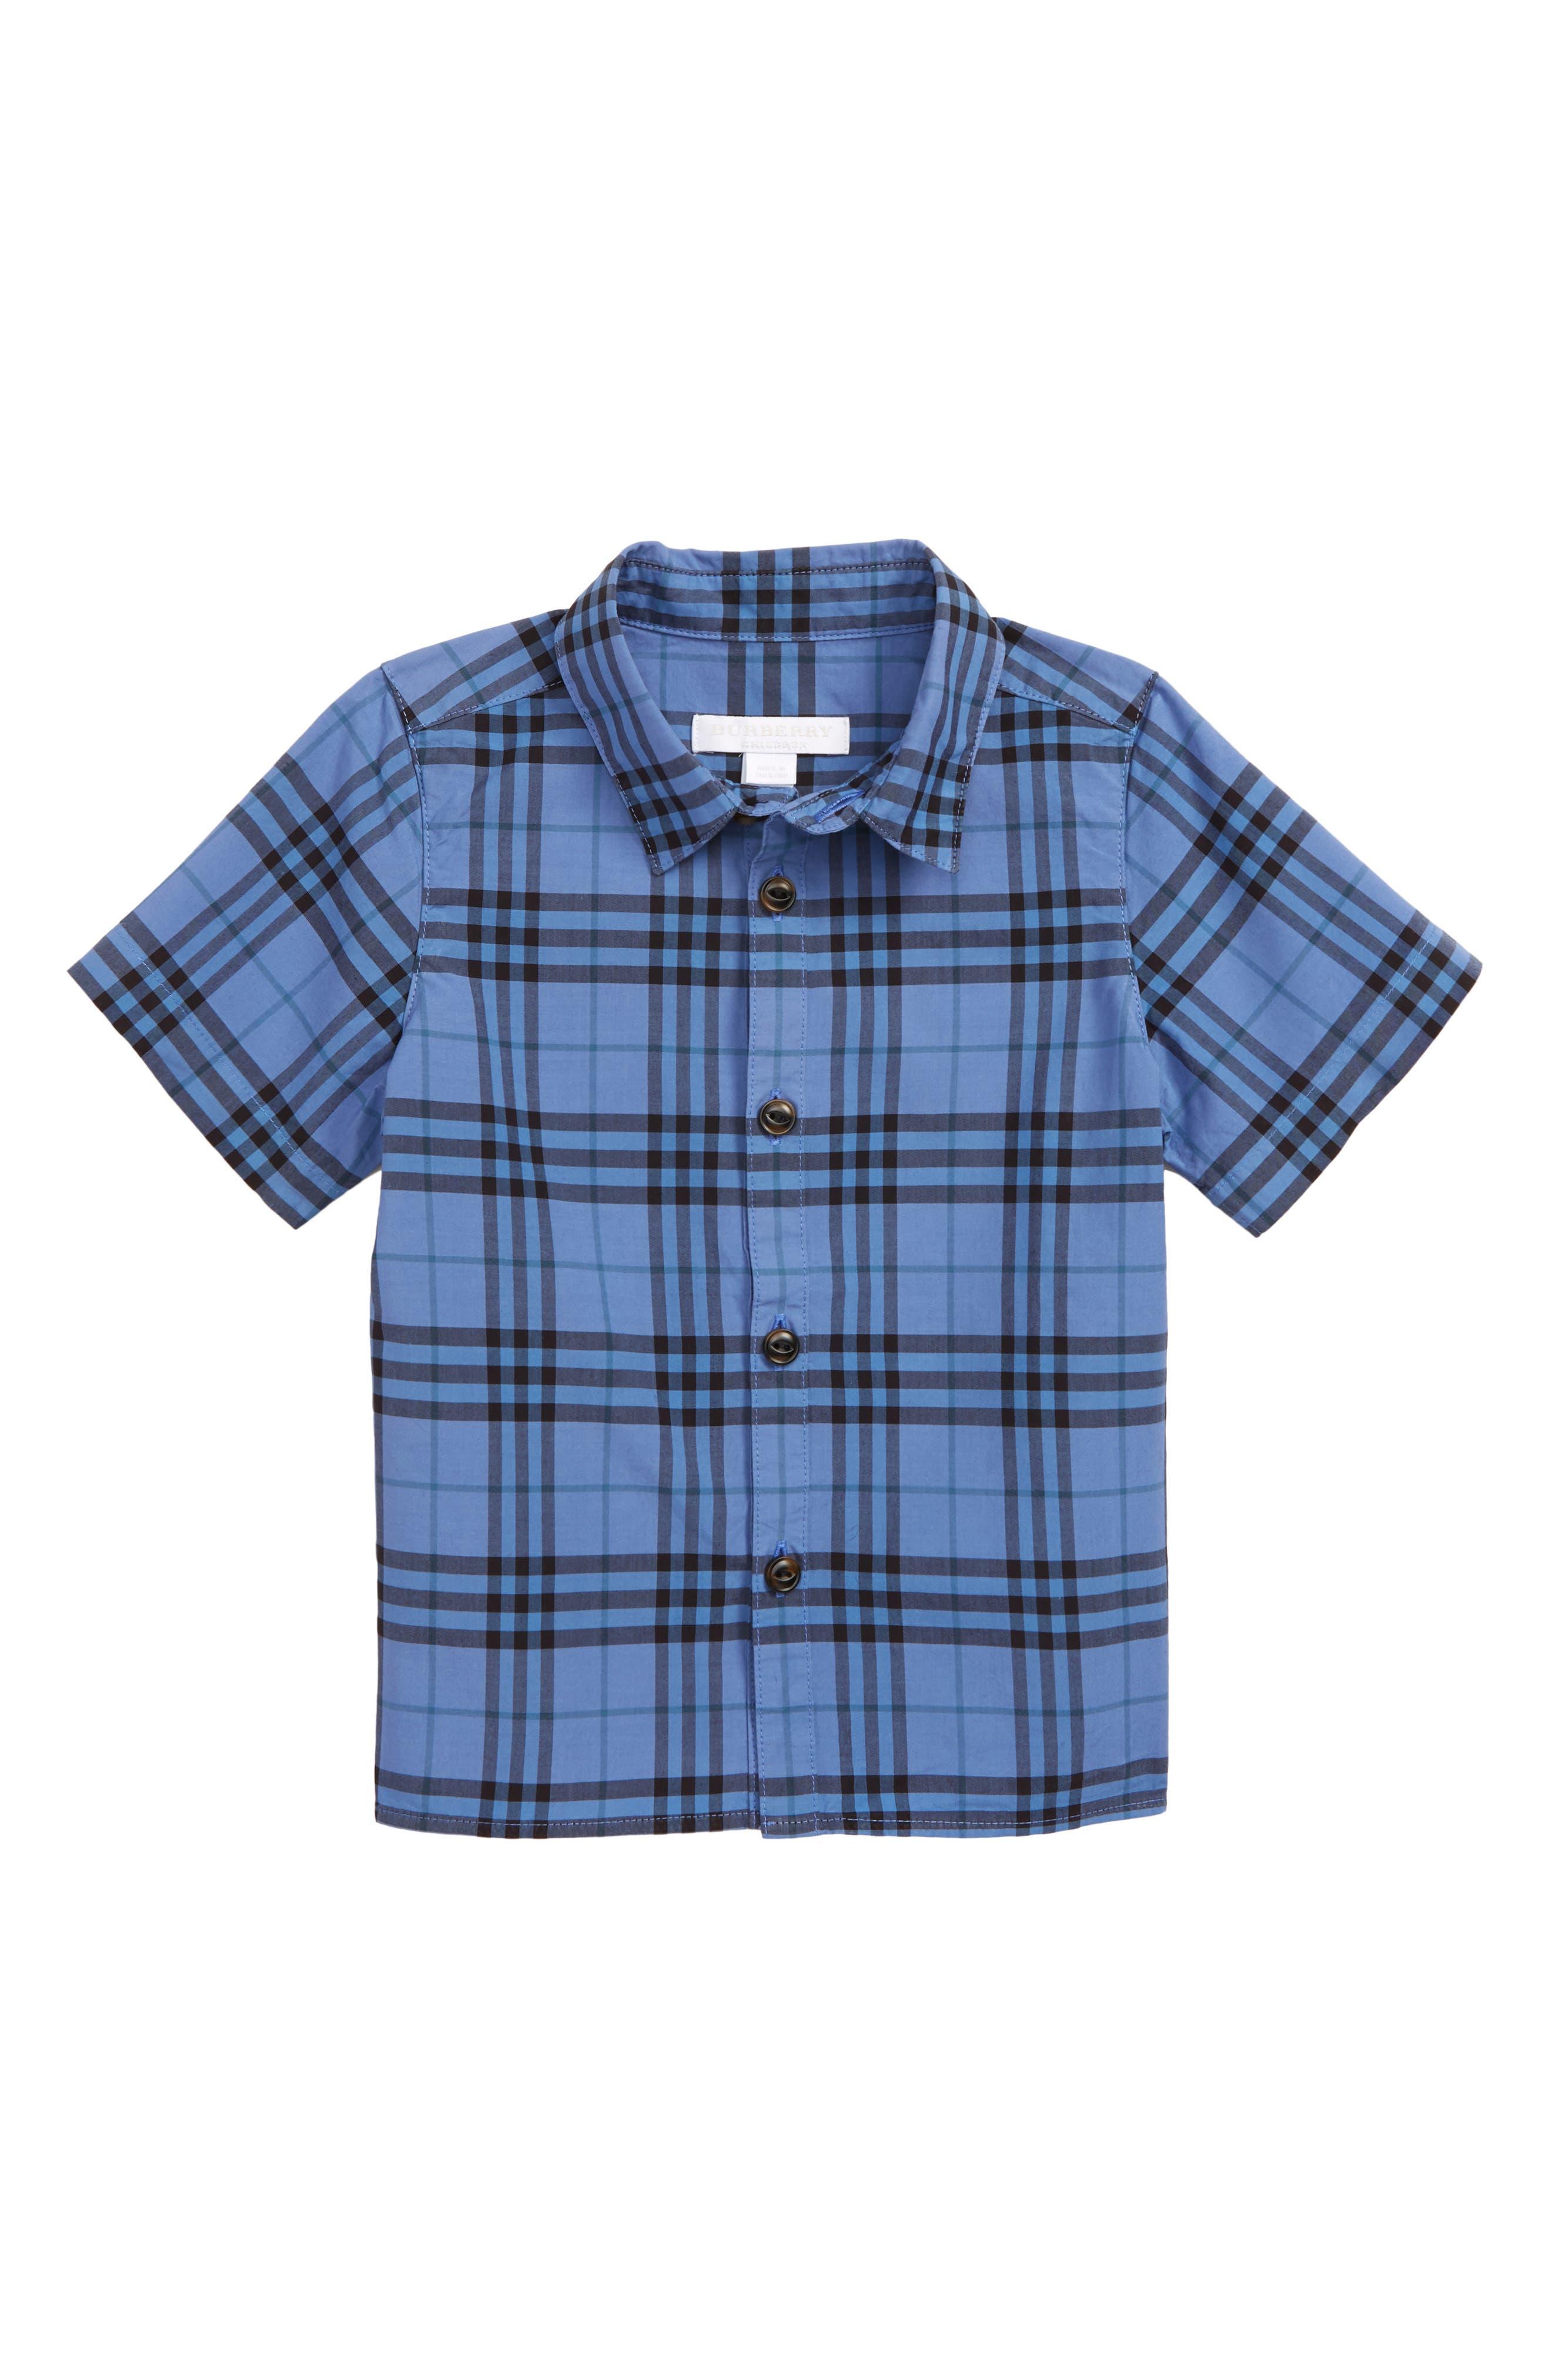 Sammi Dye Plaid Woven Shirt,                             Main thumbnail 1, color,                             DUSTY BLUE